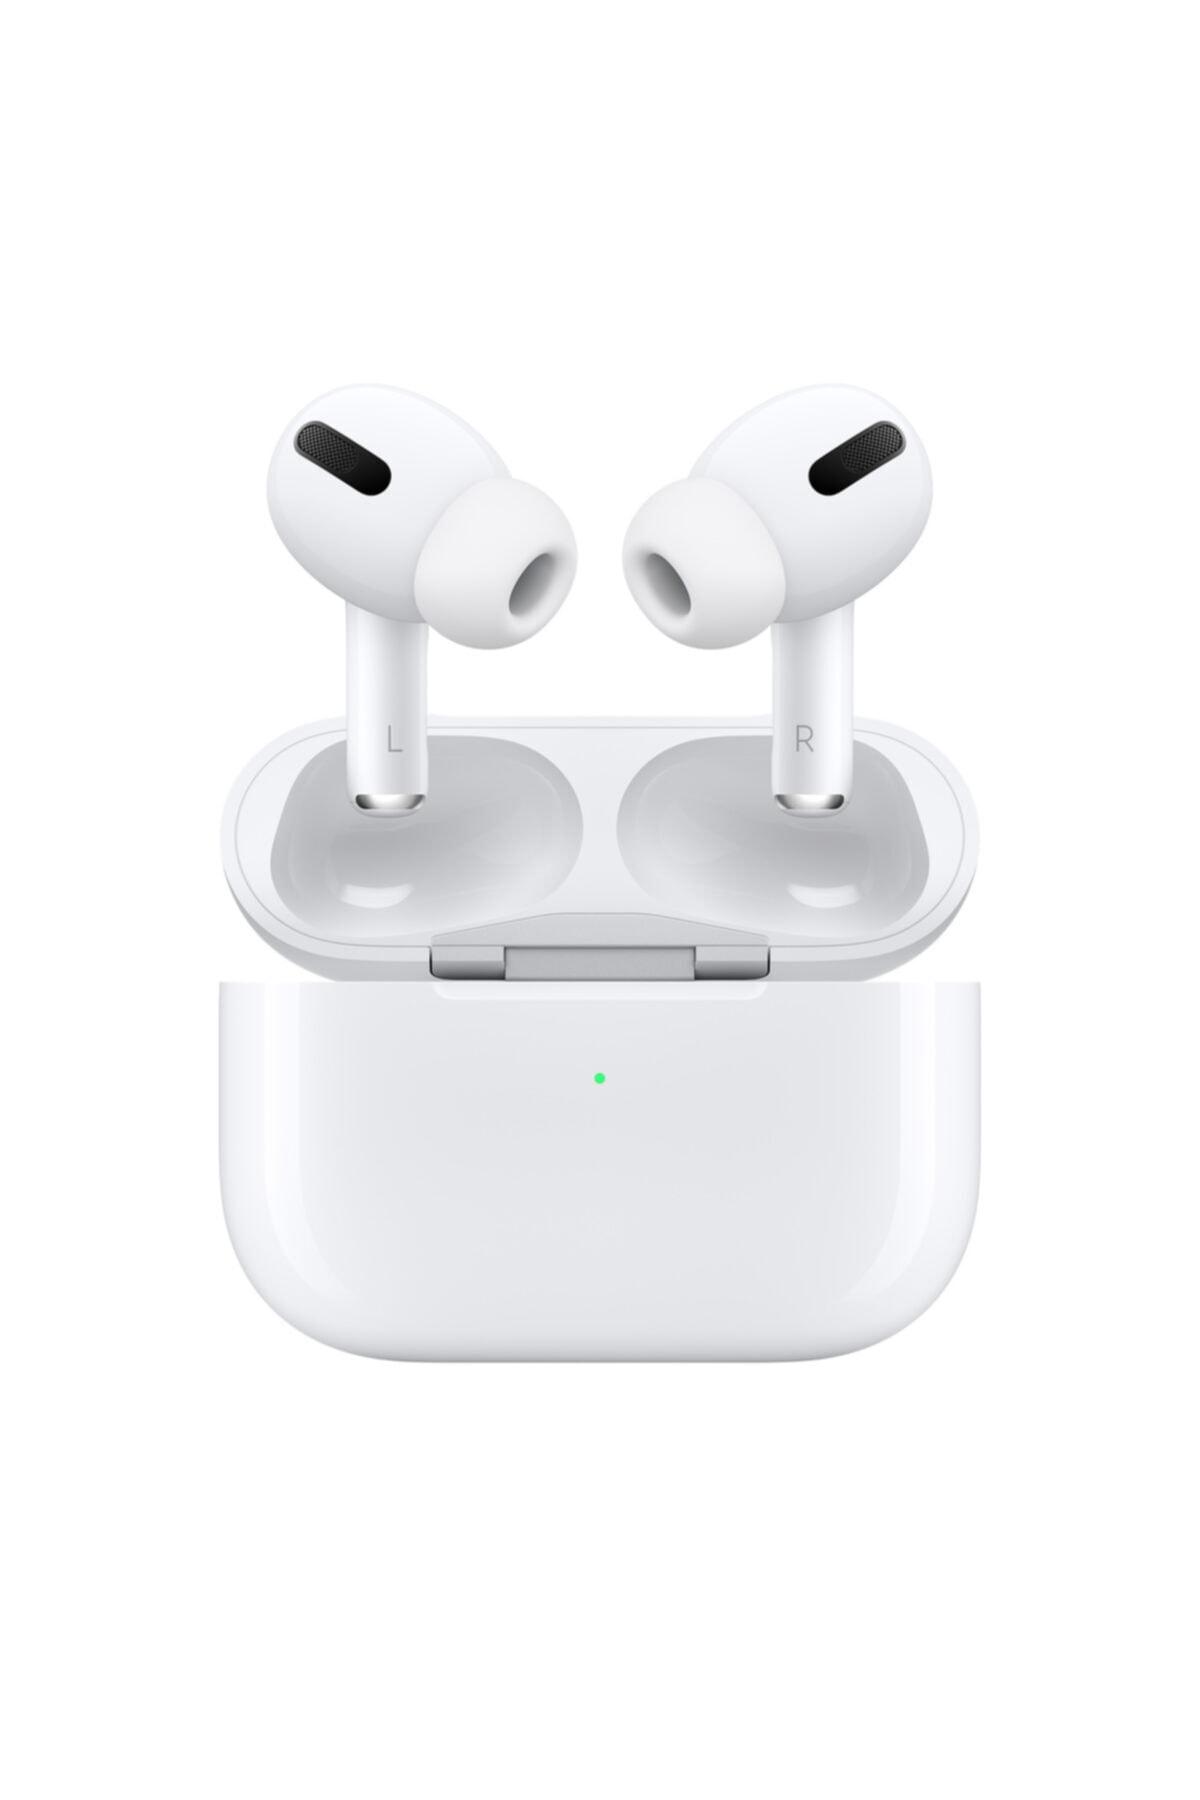 Airpods Pro Uyumlu Super Copy Seri Numaralı Logolu Bluetooth Kulaklık Dokunmatik Andorid Ios-uyumlu.